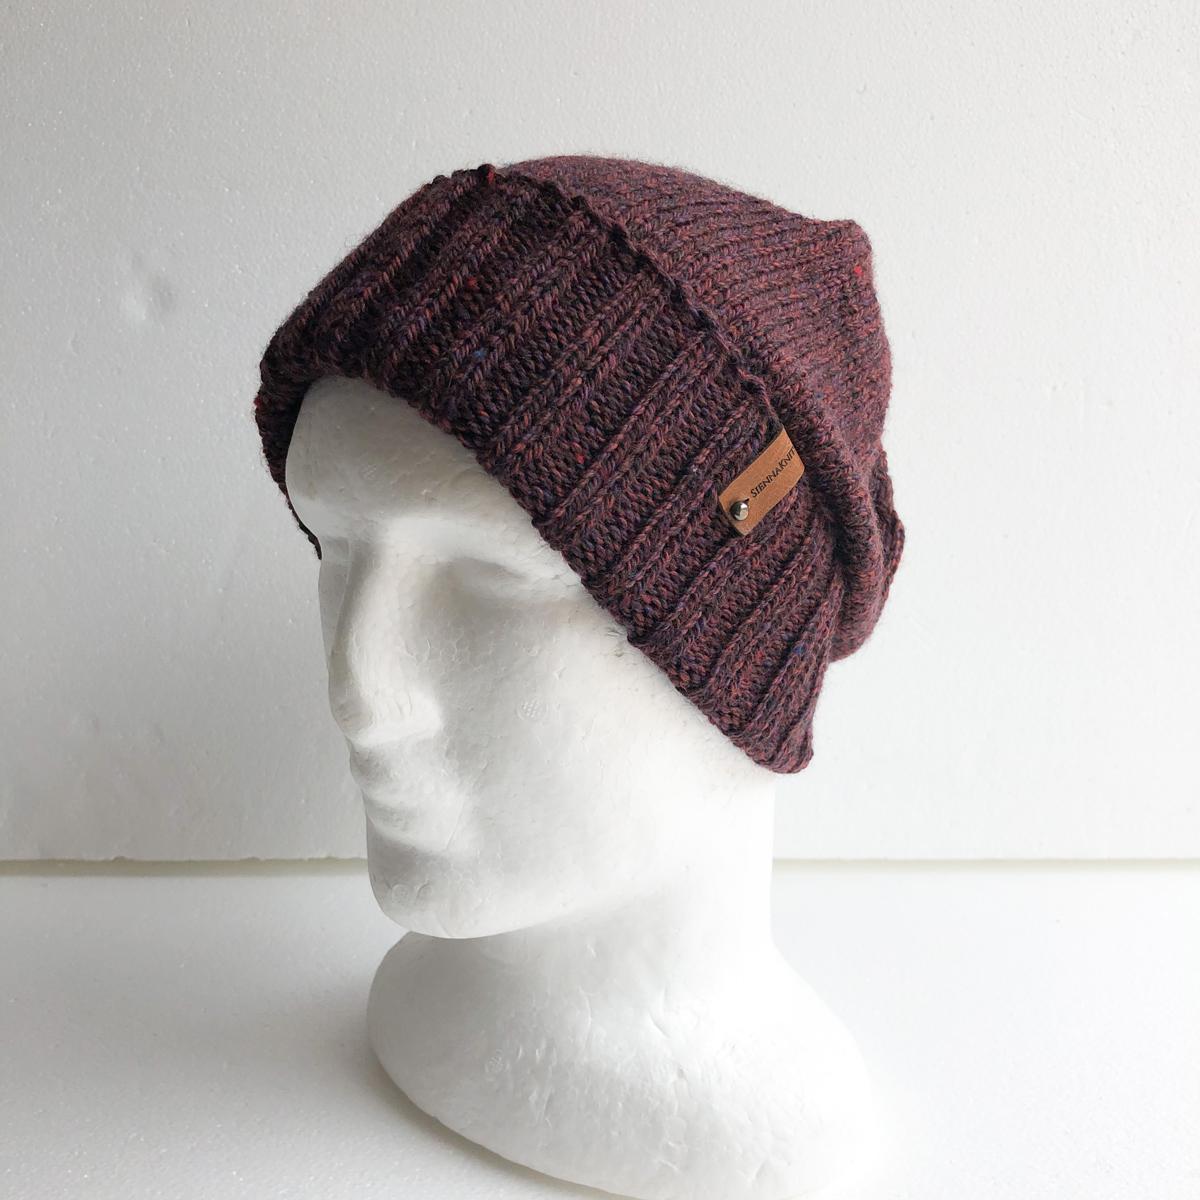 100% Wool Burgundy, Purple, Black Knit Women Beanie With Foldable Brim By SiennaKnits